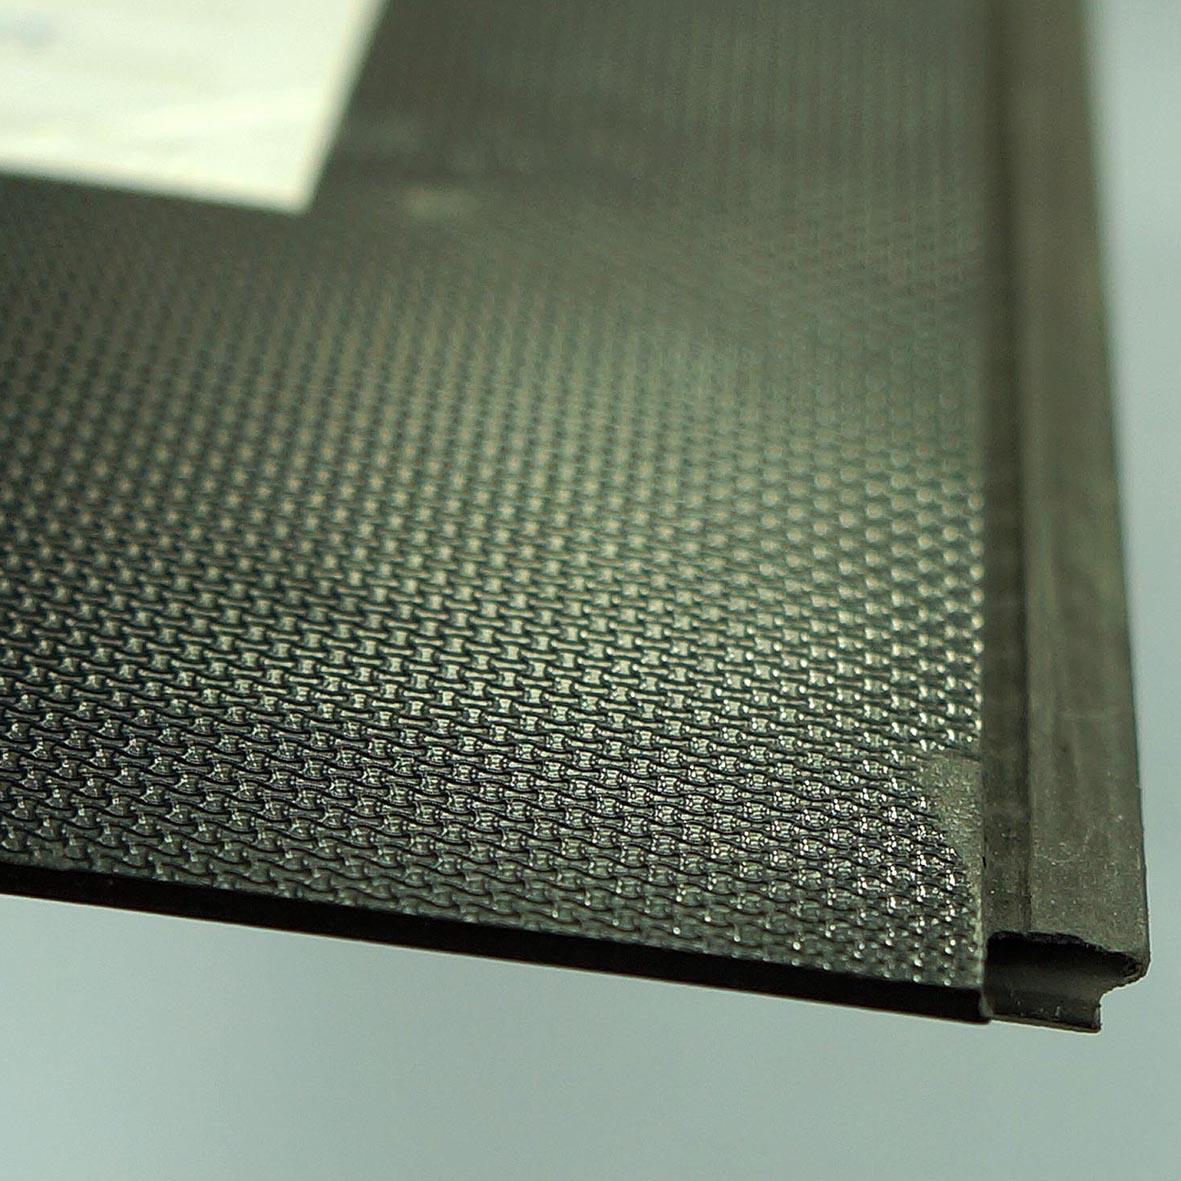 ... Wood Grain Interlocking Vinyl Flooring Tiles Part 97